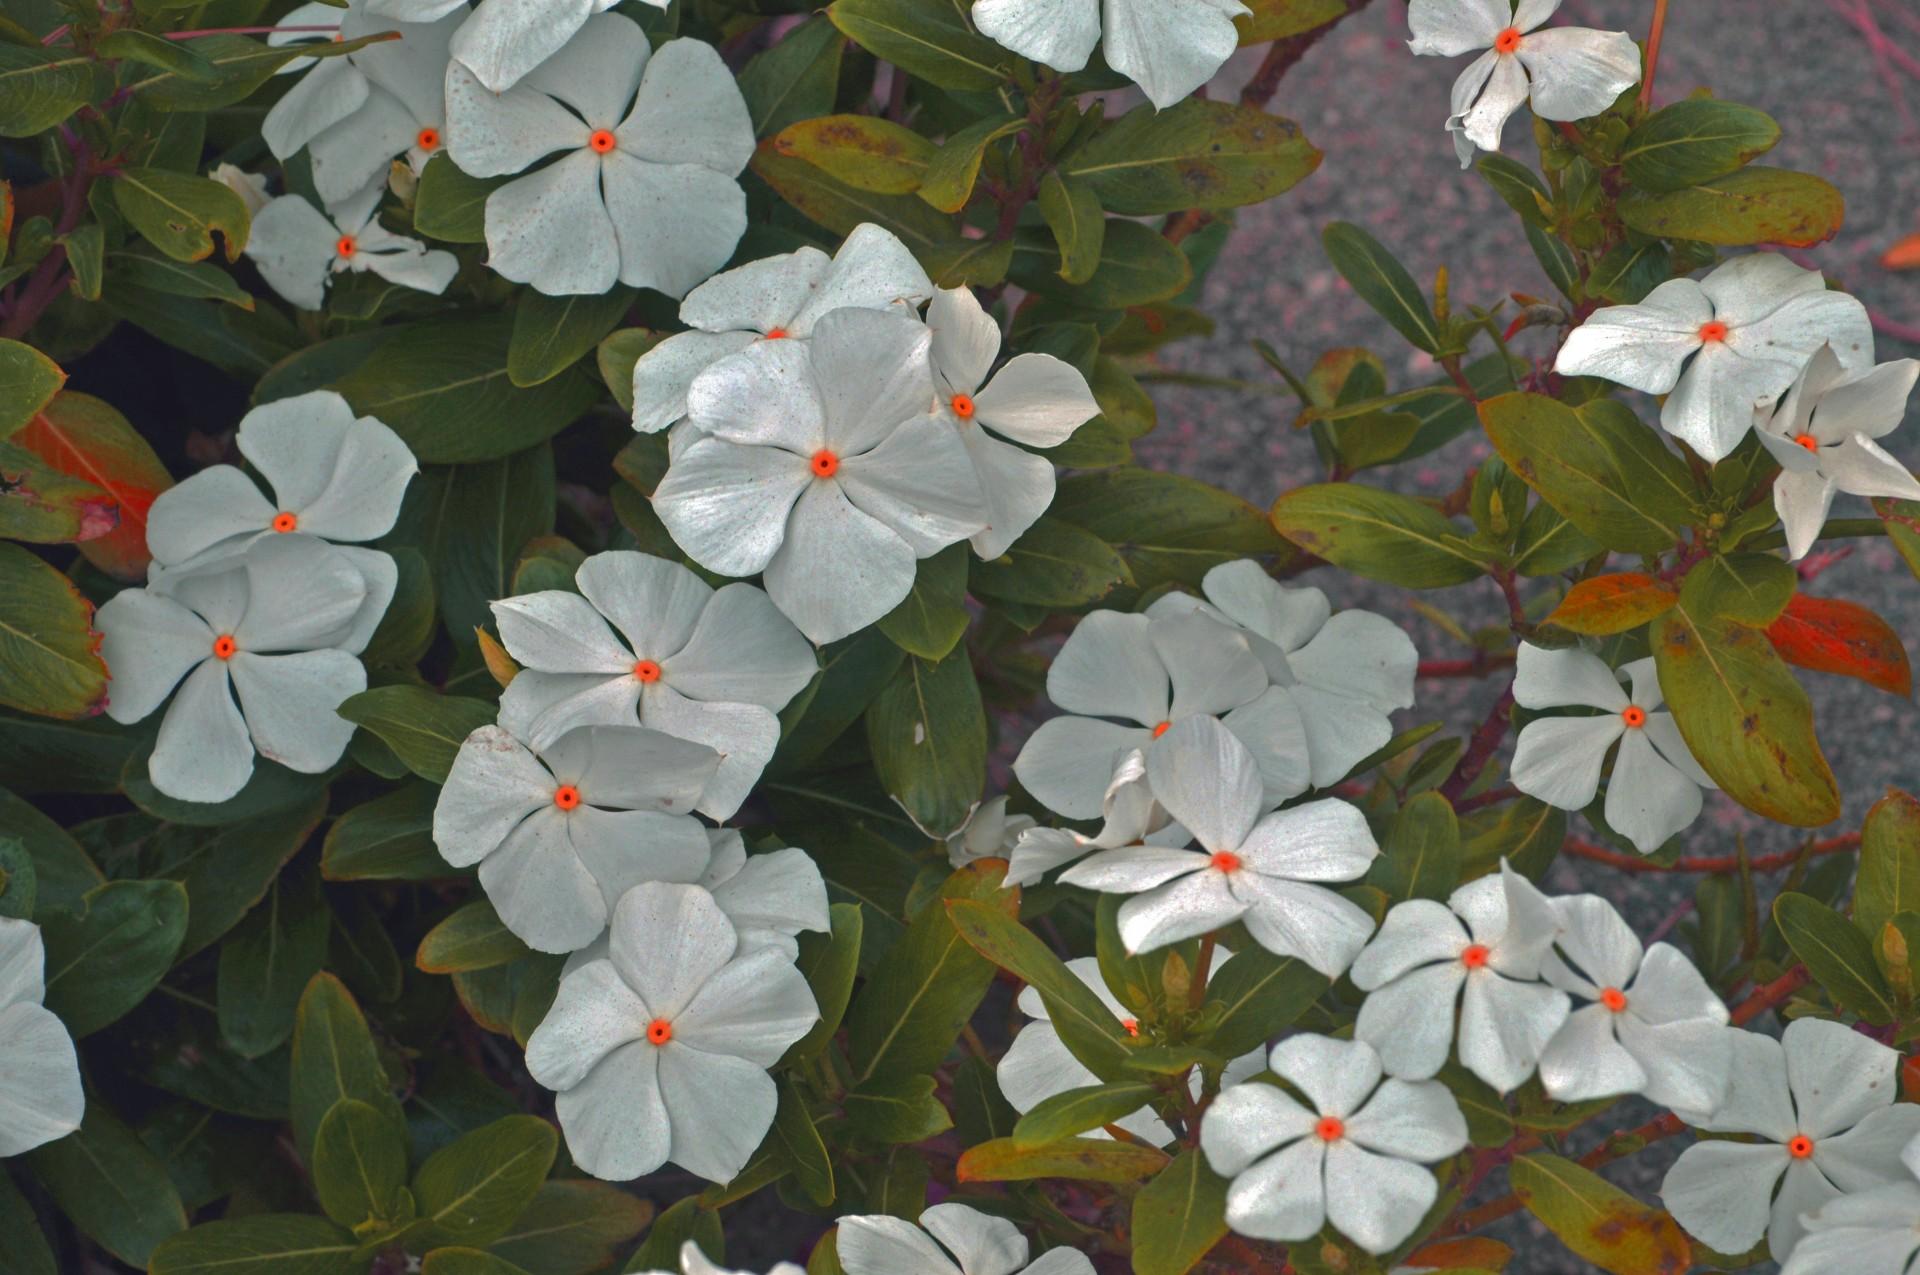 White Flowers Orange Centers Free Stock Photo - Public Domain Pictures